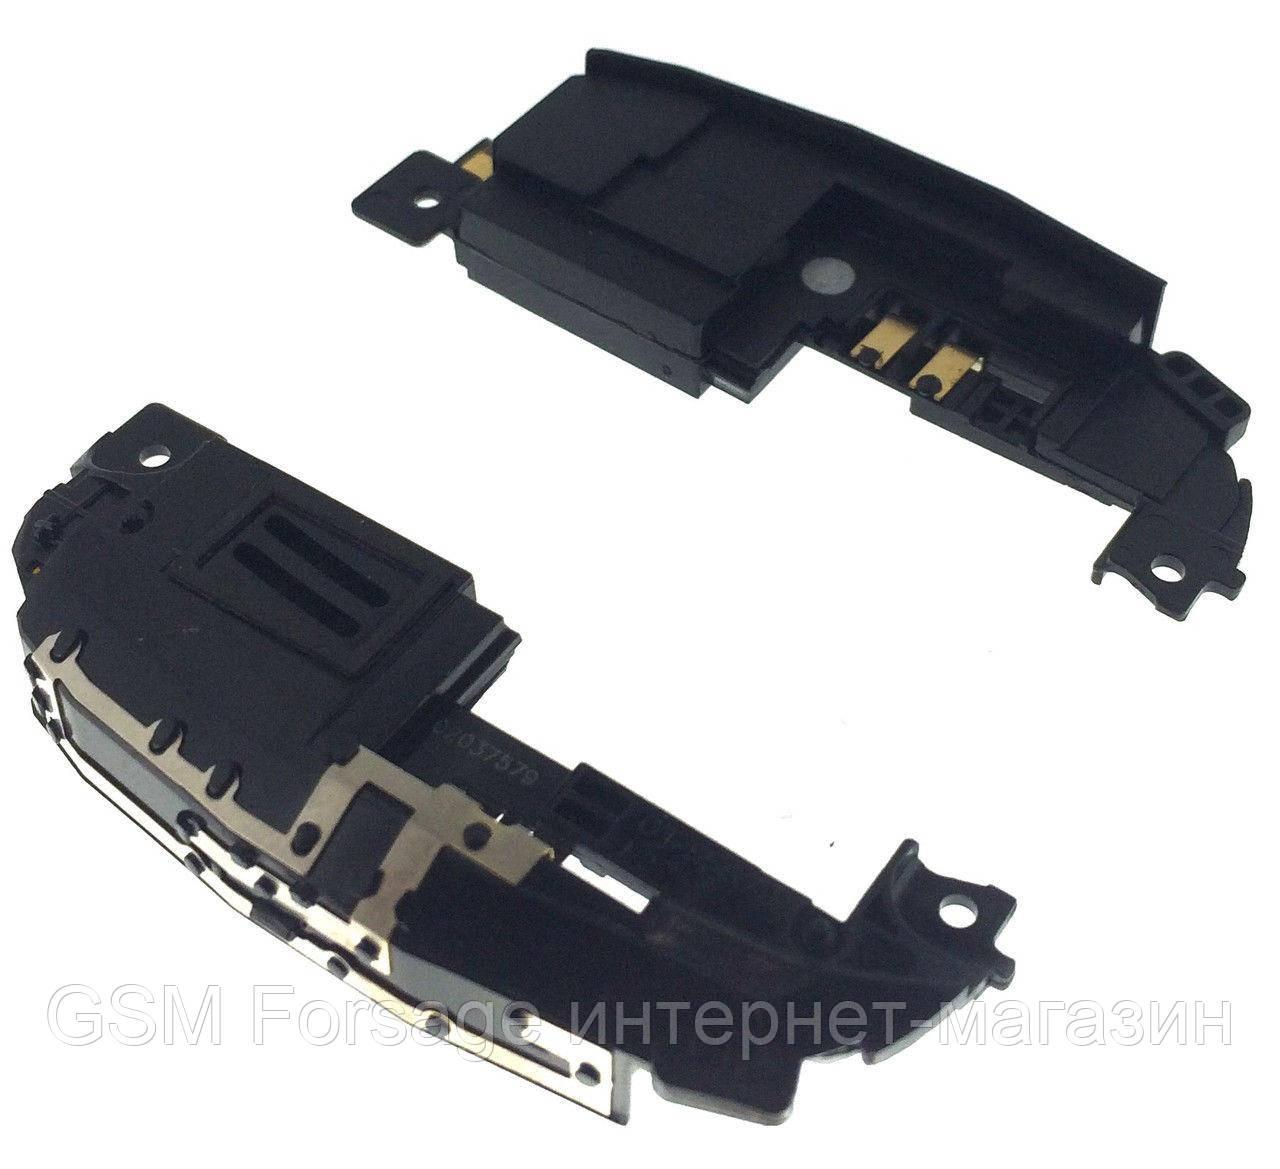 Бузер Samsung Galaxy Fit GT-S5670 с резонатором Original